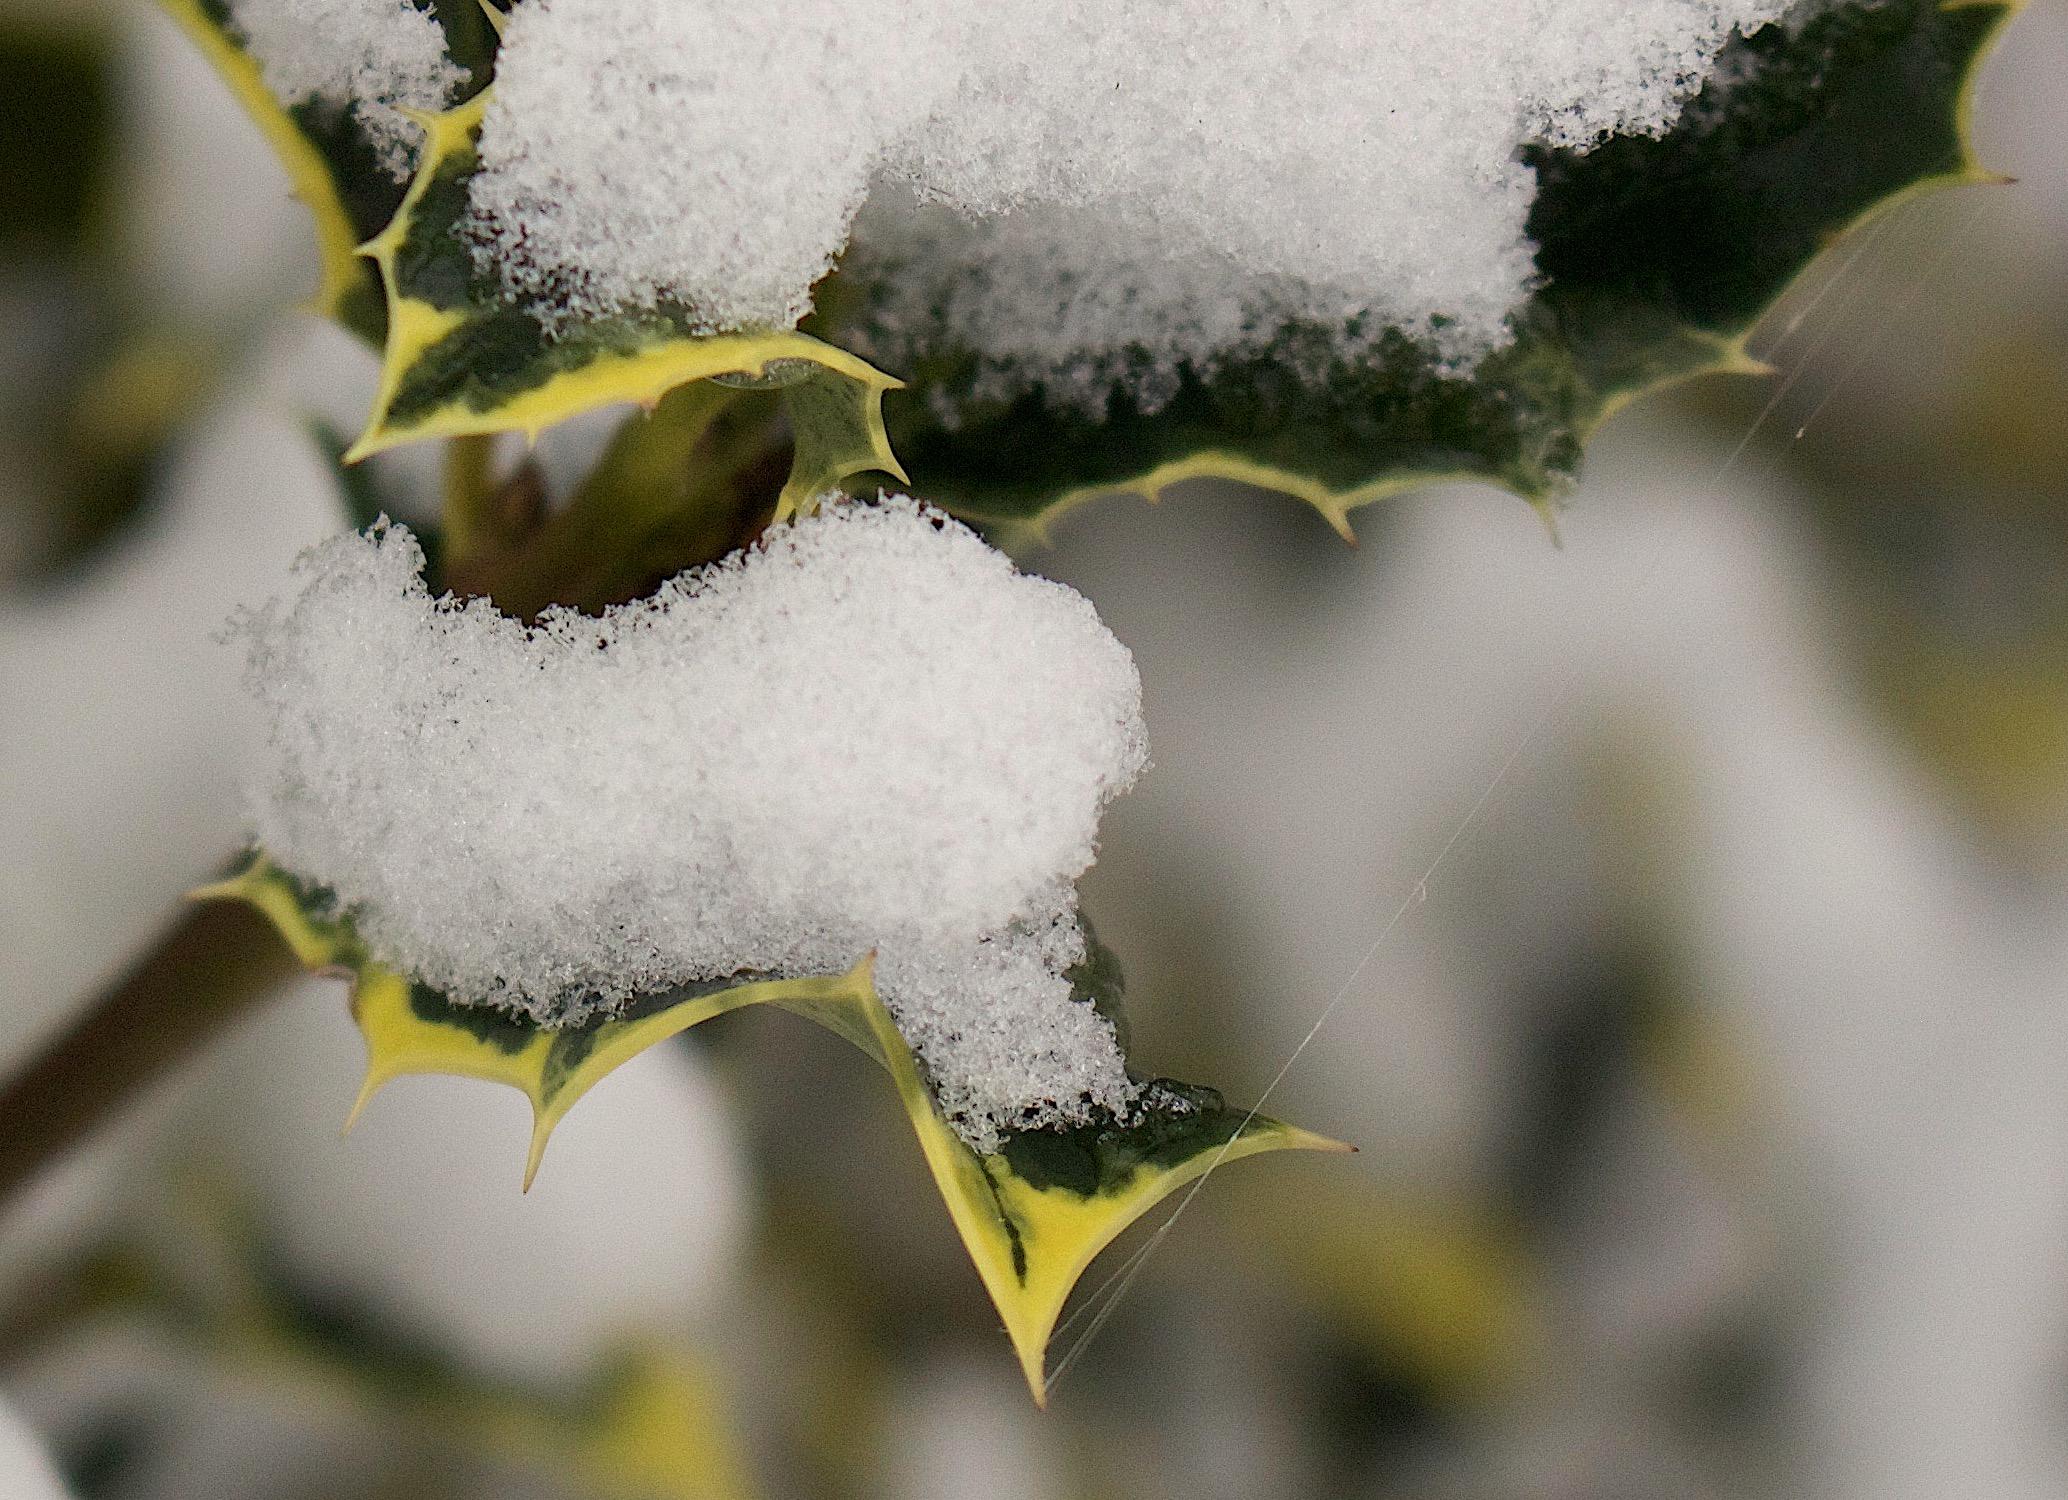 frozenthread